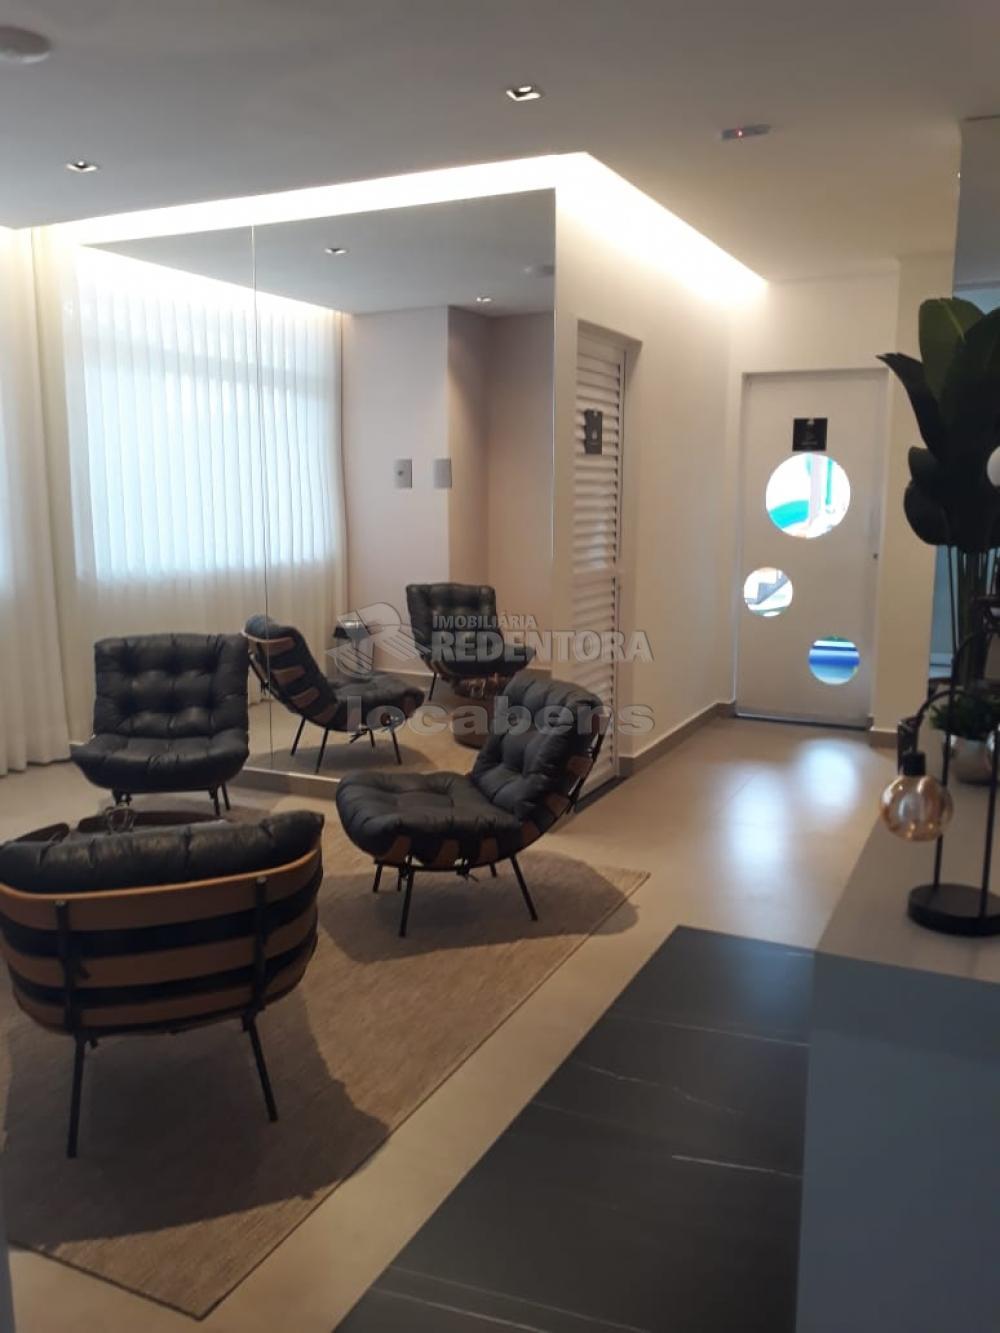 Sao Jose do Rio Preto Apartamento Venda R$350.000,00 Condominio R$400,00 2 Dormitorios 2 Vagas Area construida 100.00m2